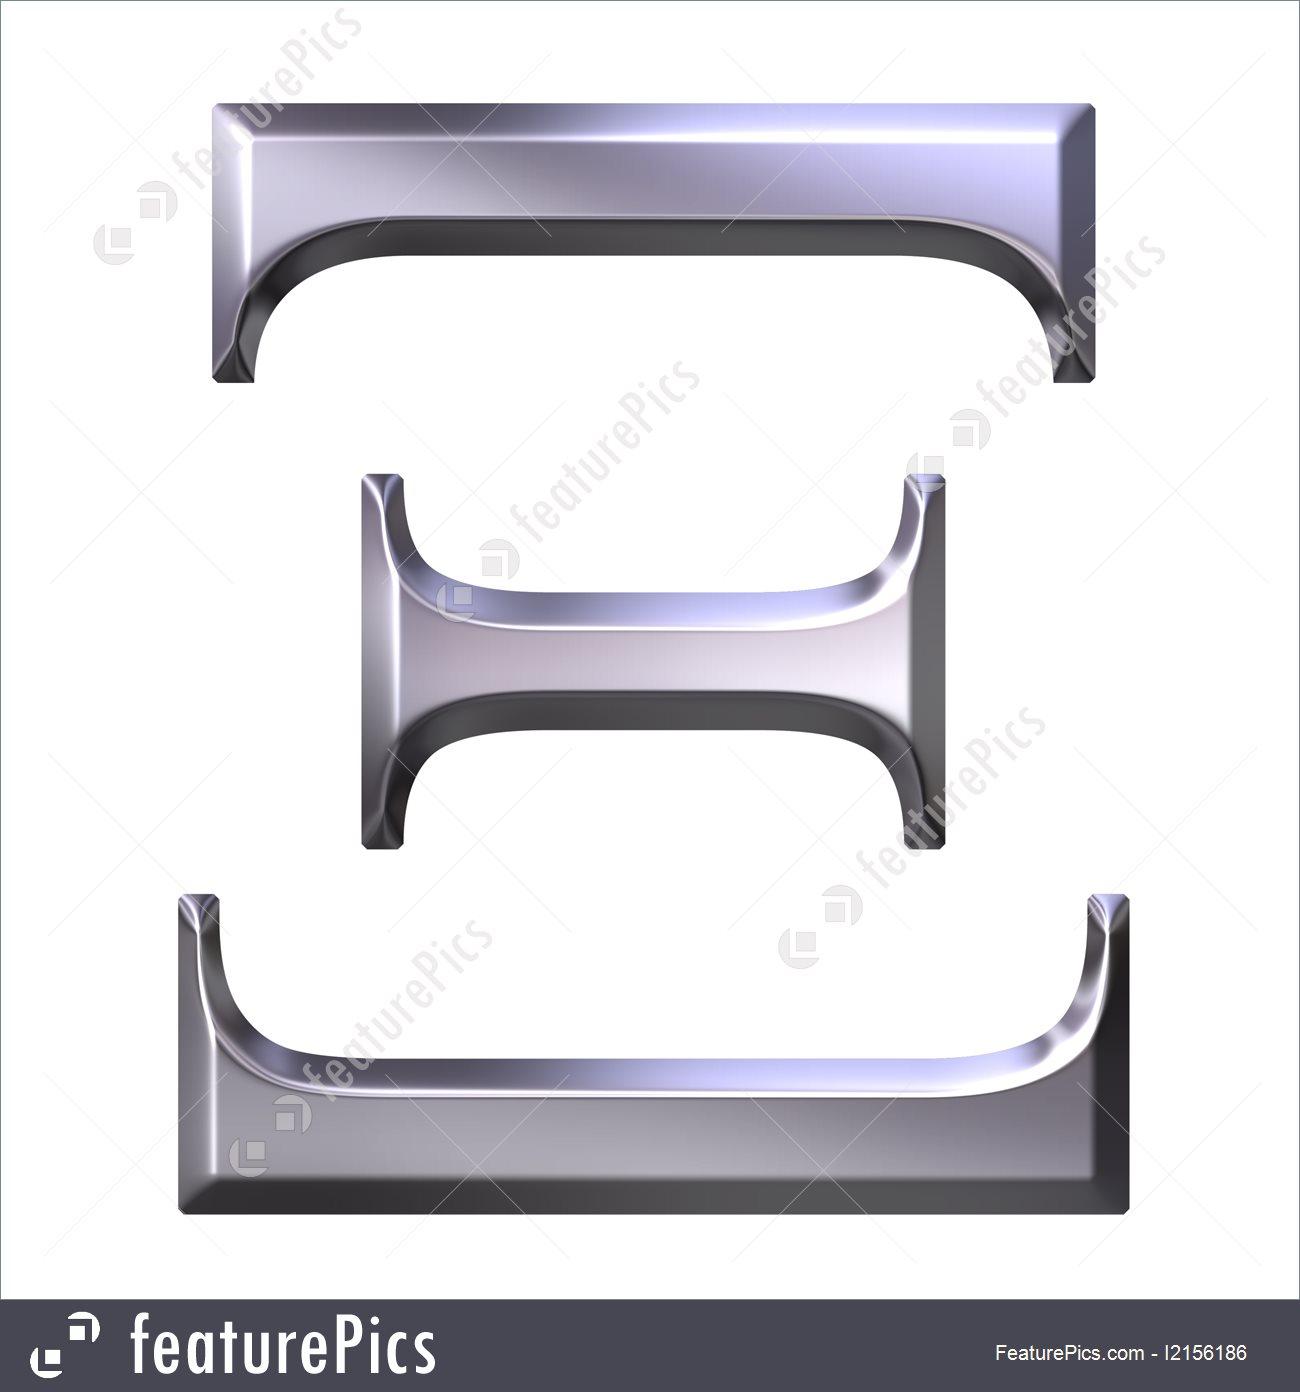 Xi greek letter clipart svg freeuse stock 3D Silver Greek Letter Xi Illustration svg freeuse stock